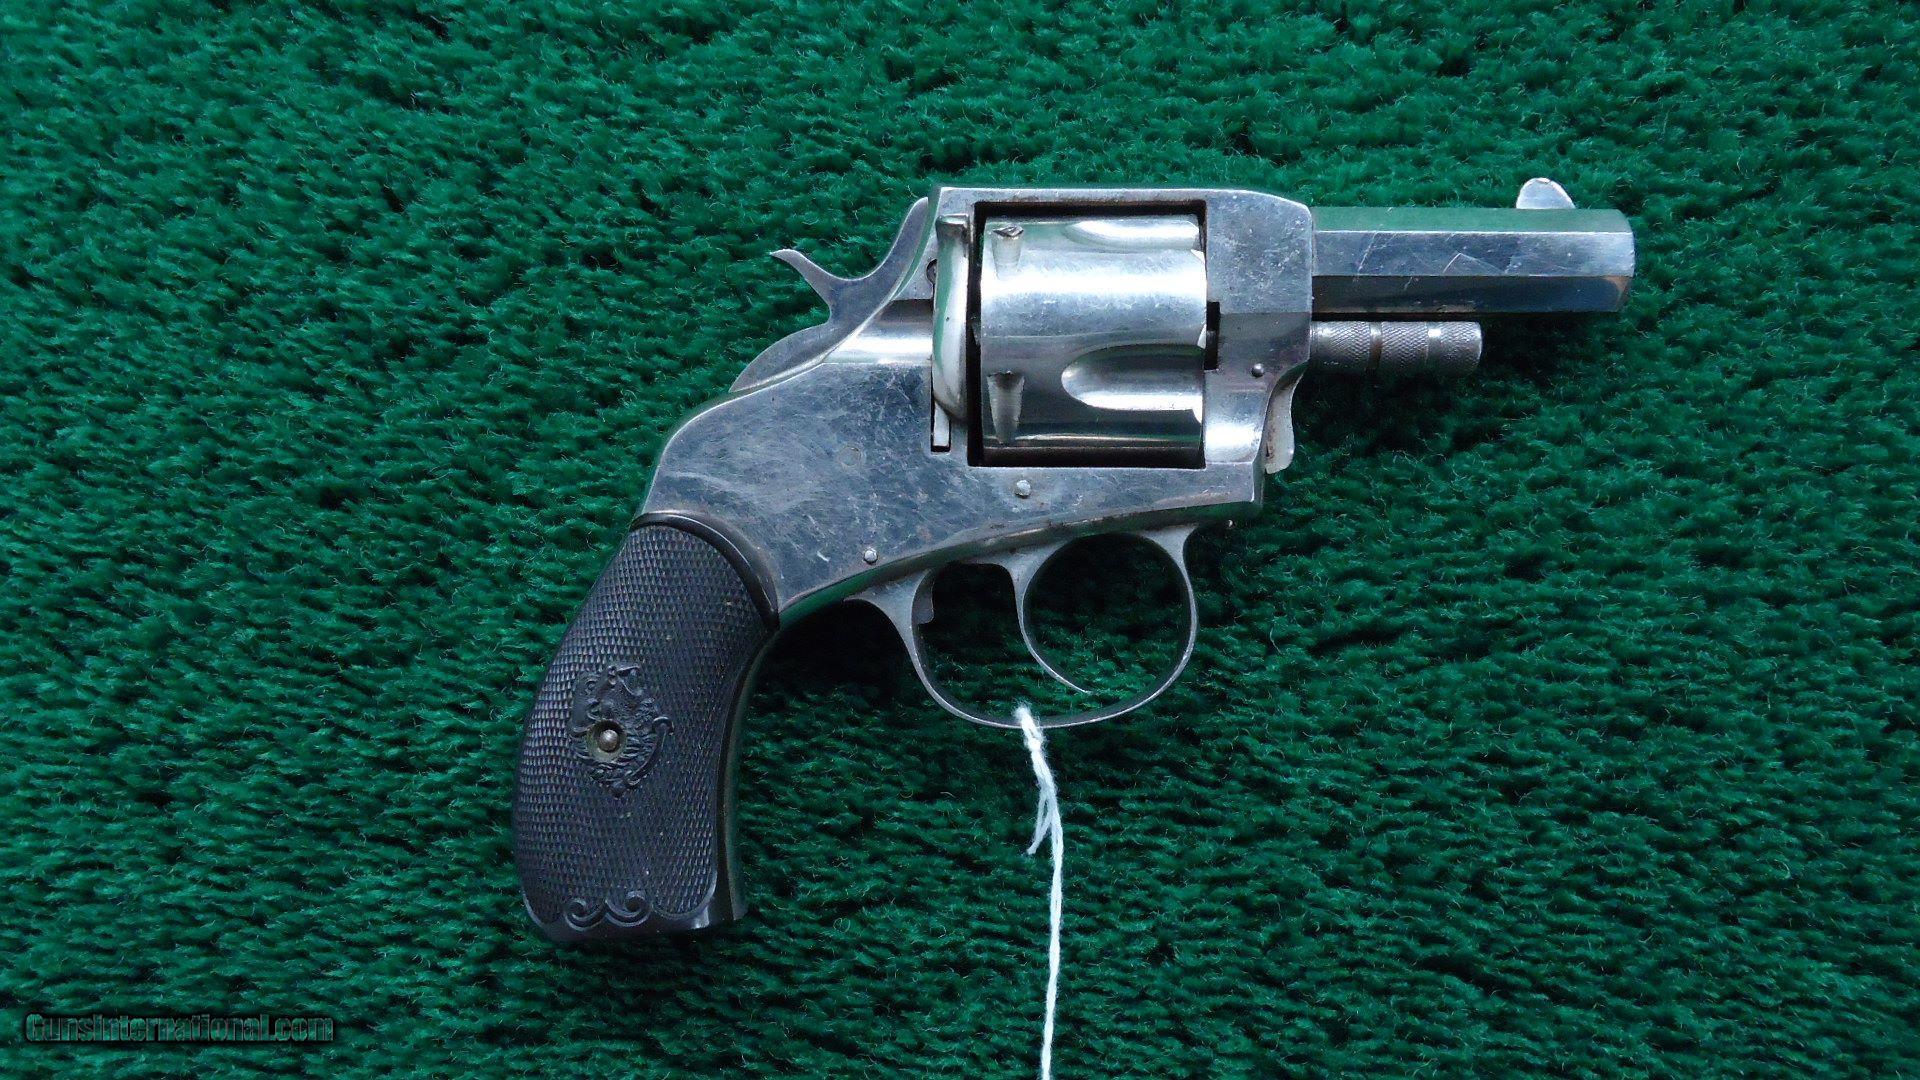 Iver Johnson Extra Large Frame American Bulldog Revolver